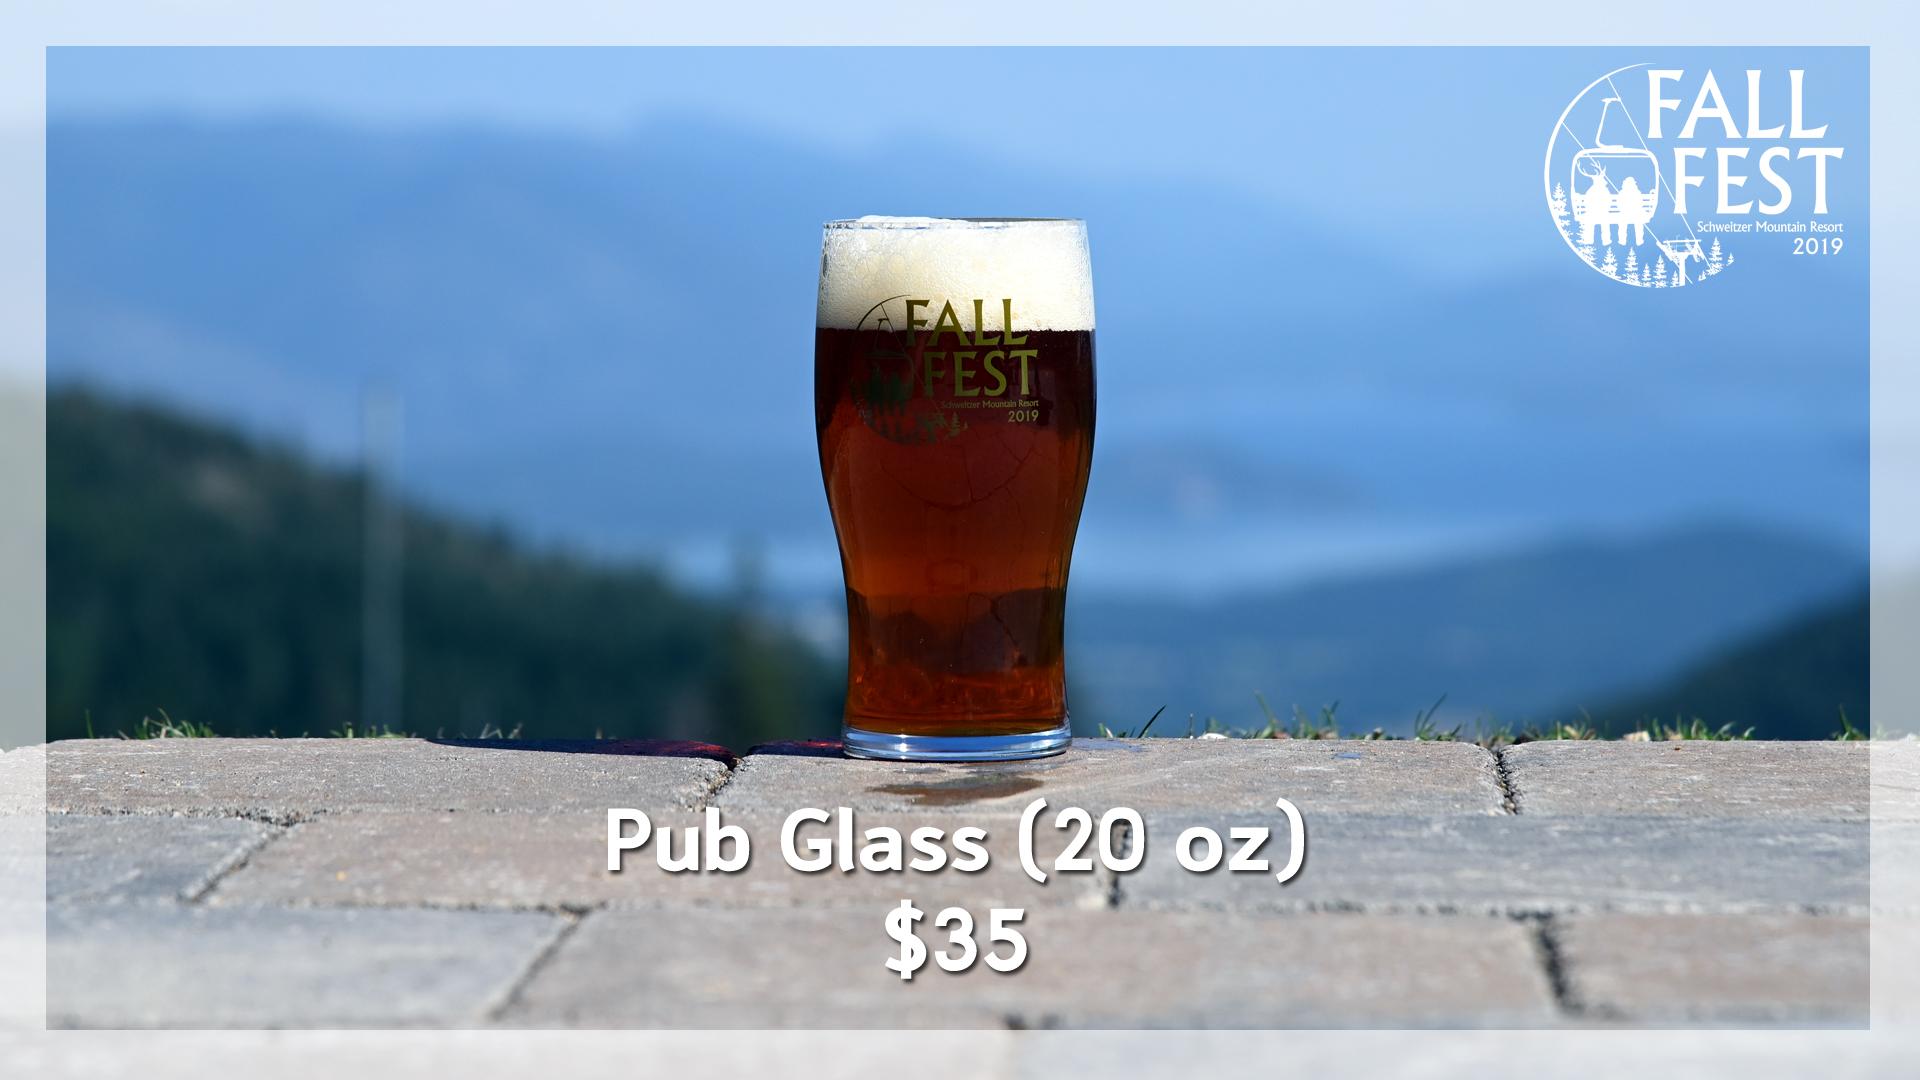 Fall Fest Pub Glass